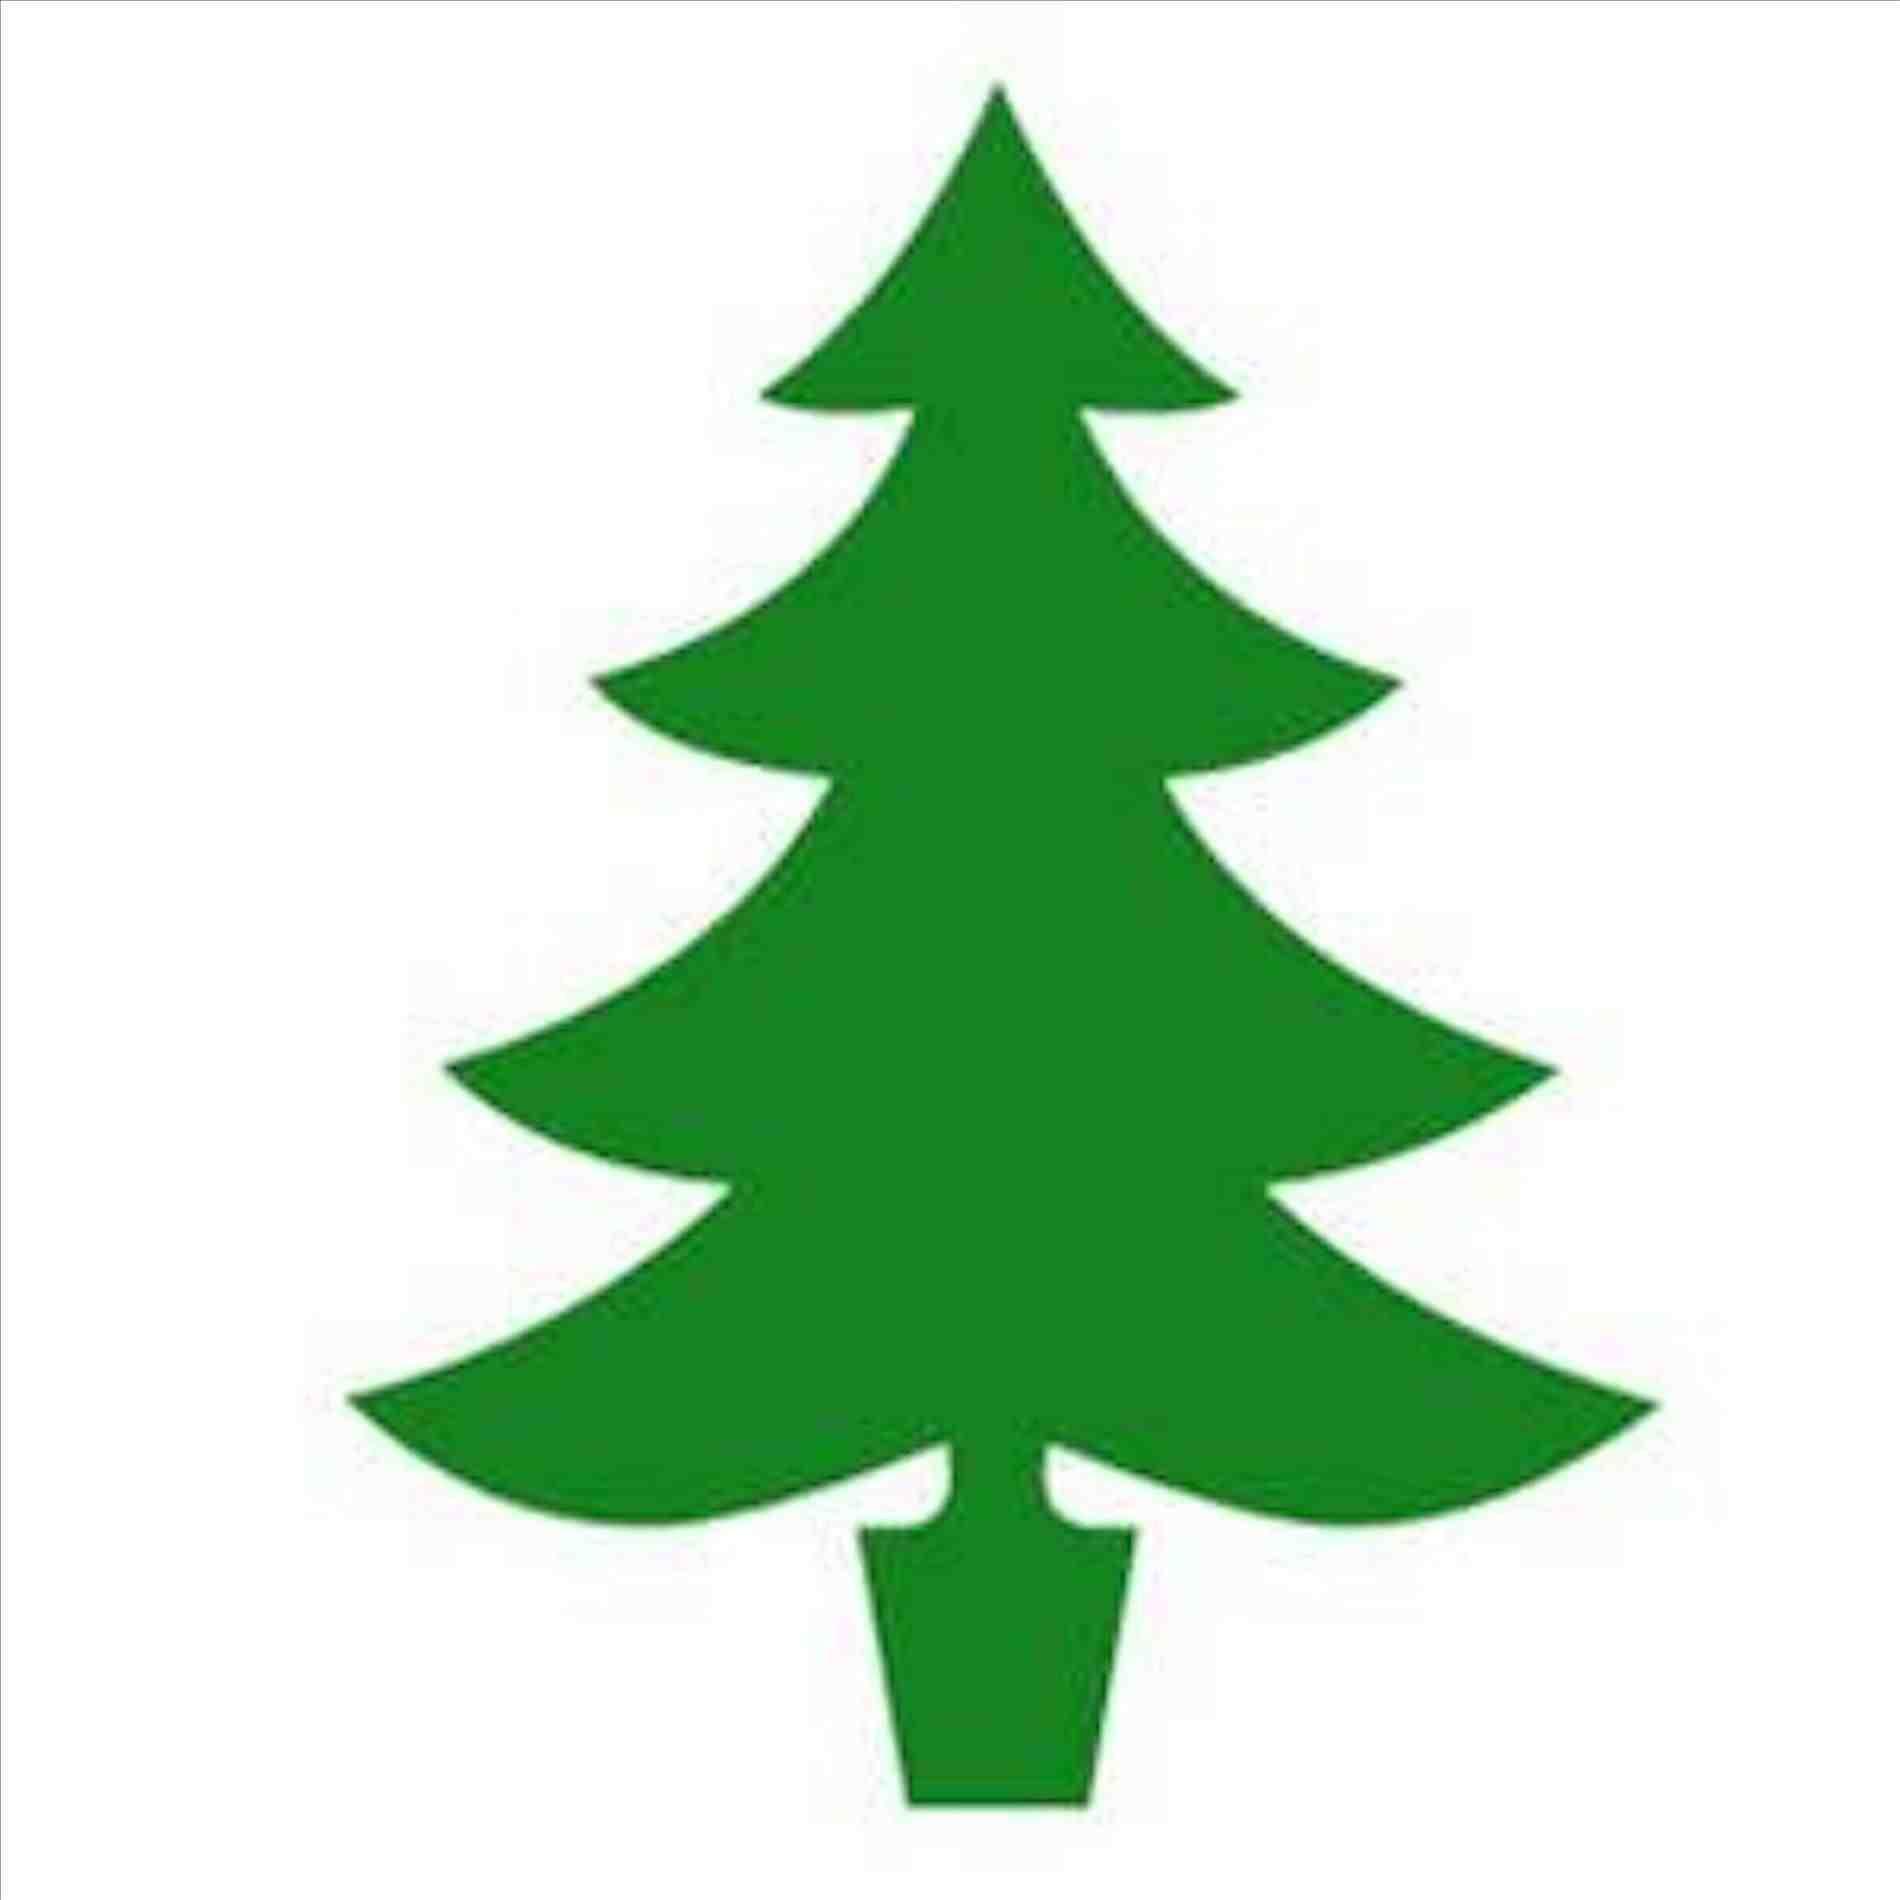 1900x1900 Art Silhouette Clipart Best Scan N Cut Silhouette Green Christmas